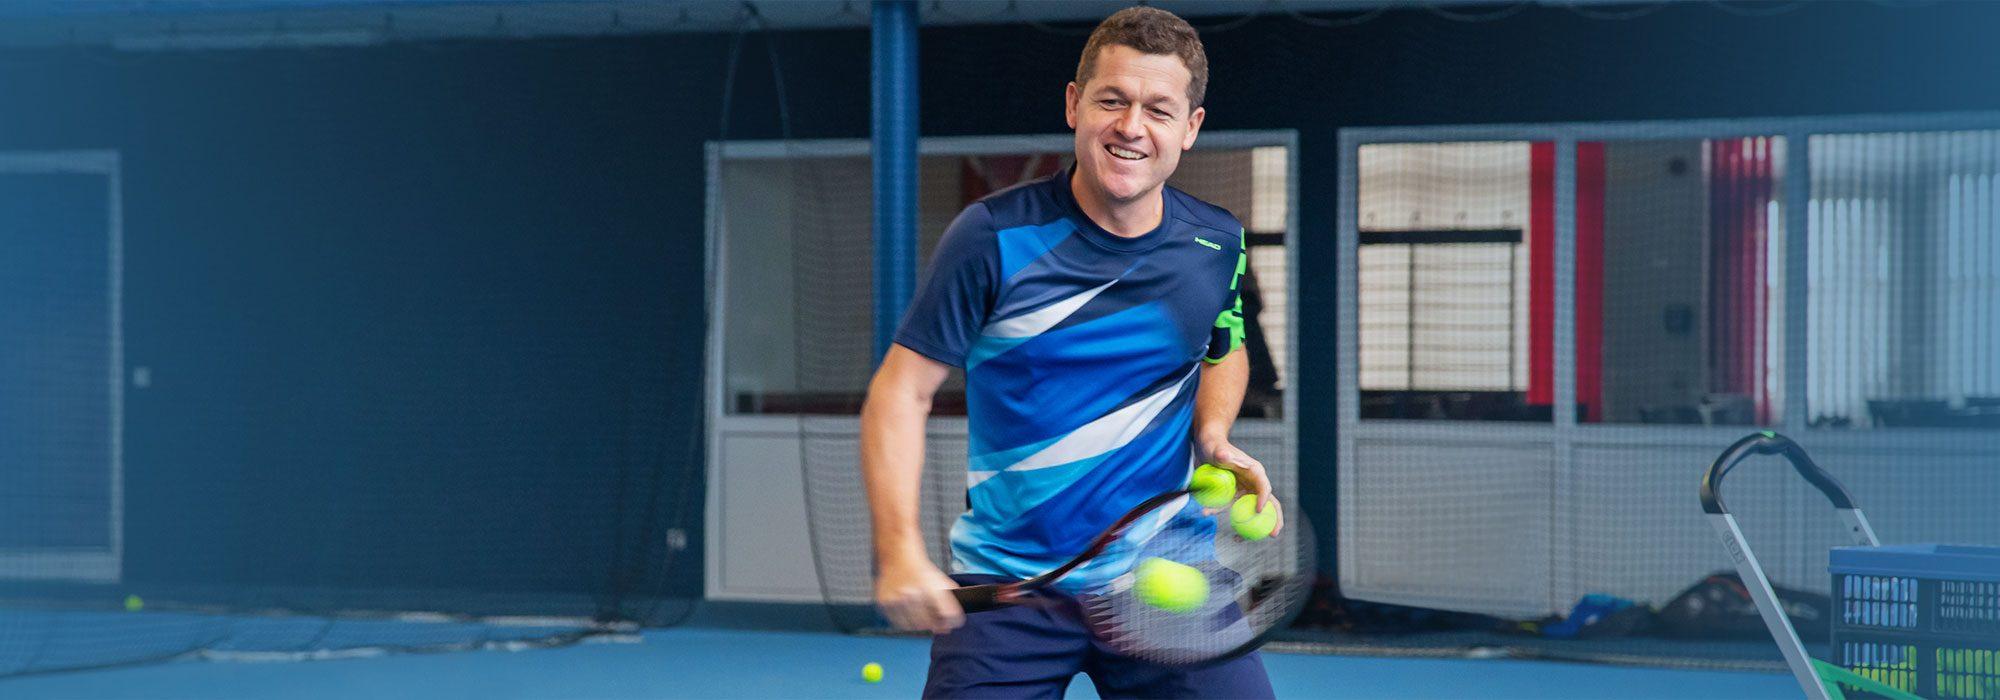 Tennistrainer Raimund Knogler | Ex-Bundesligaspieler